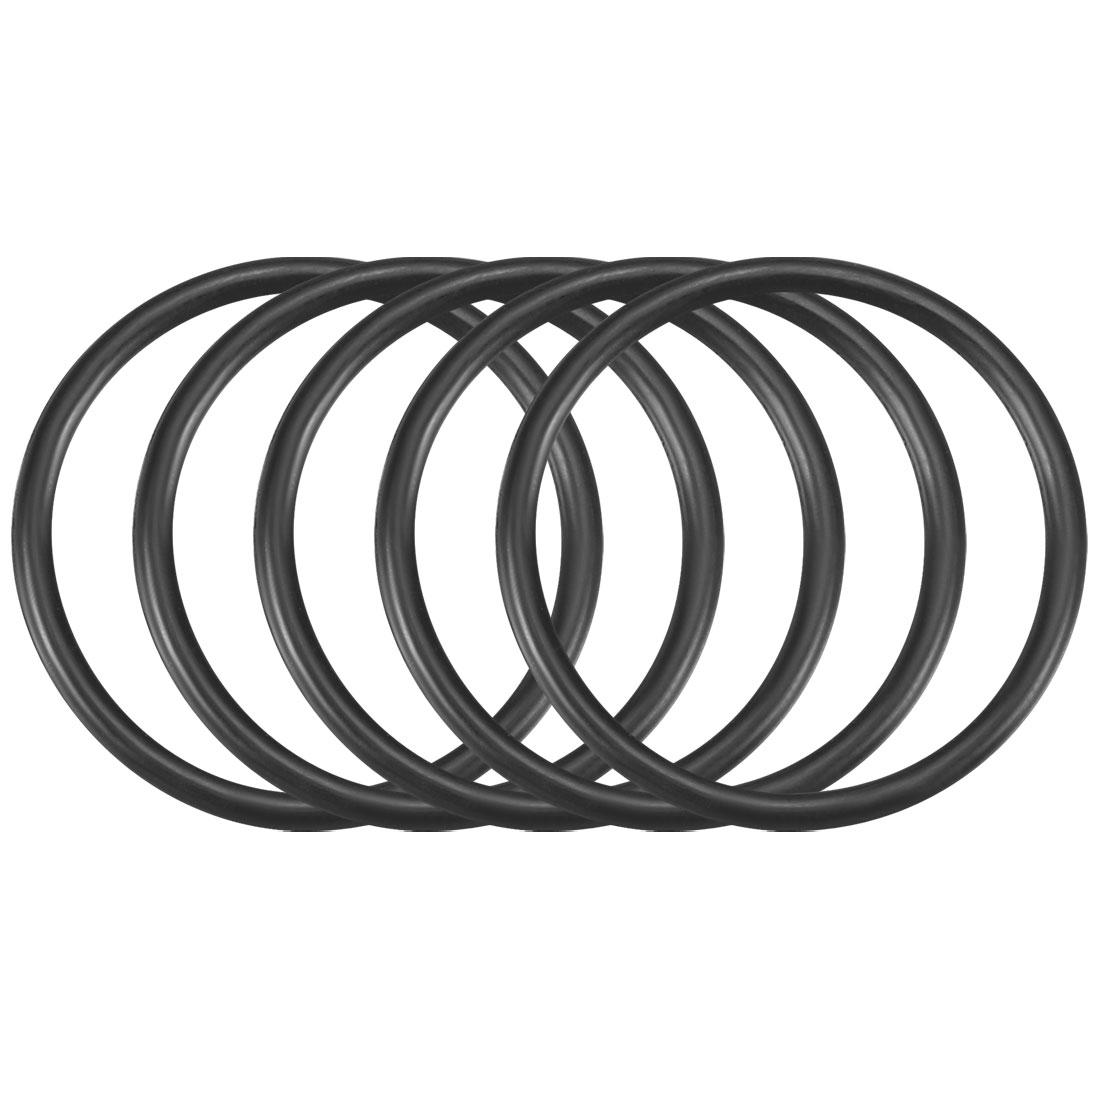 50Pcs Black 21mm x 1.5mm Nitrile Rubber O Ring NBR Oil Sealing Grommets